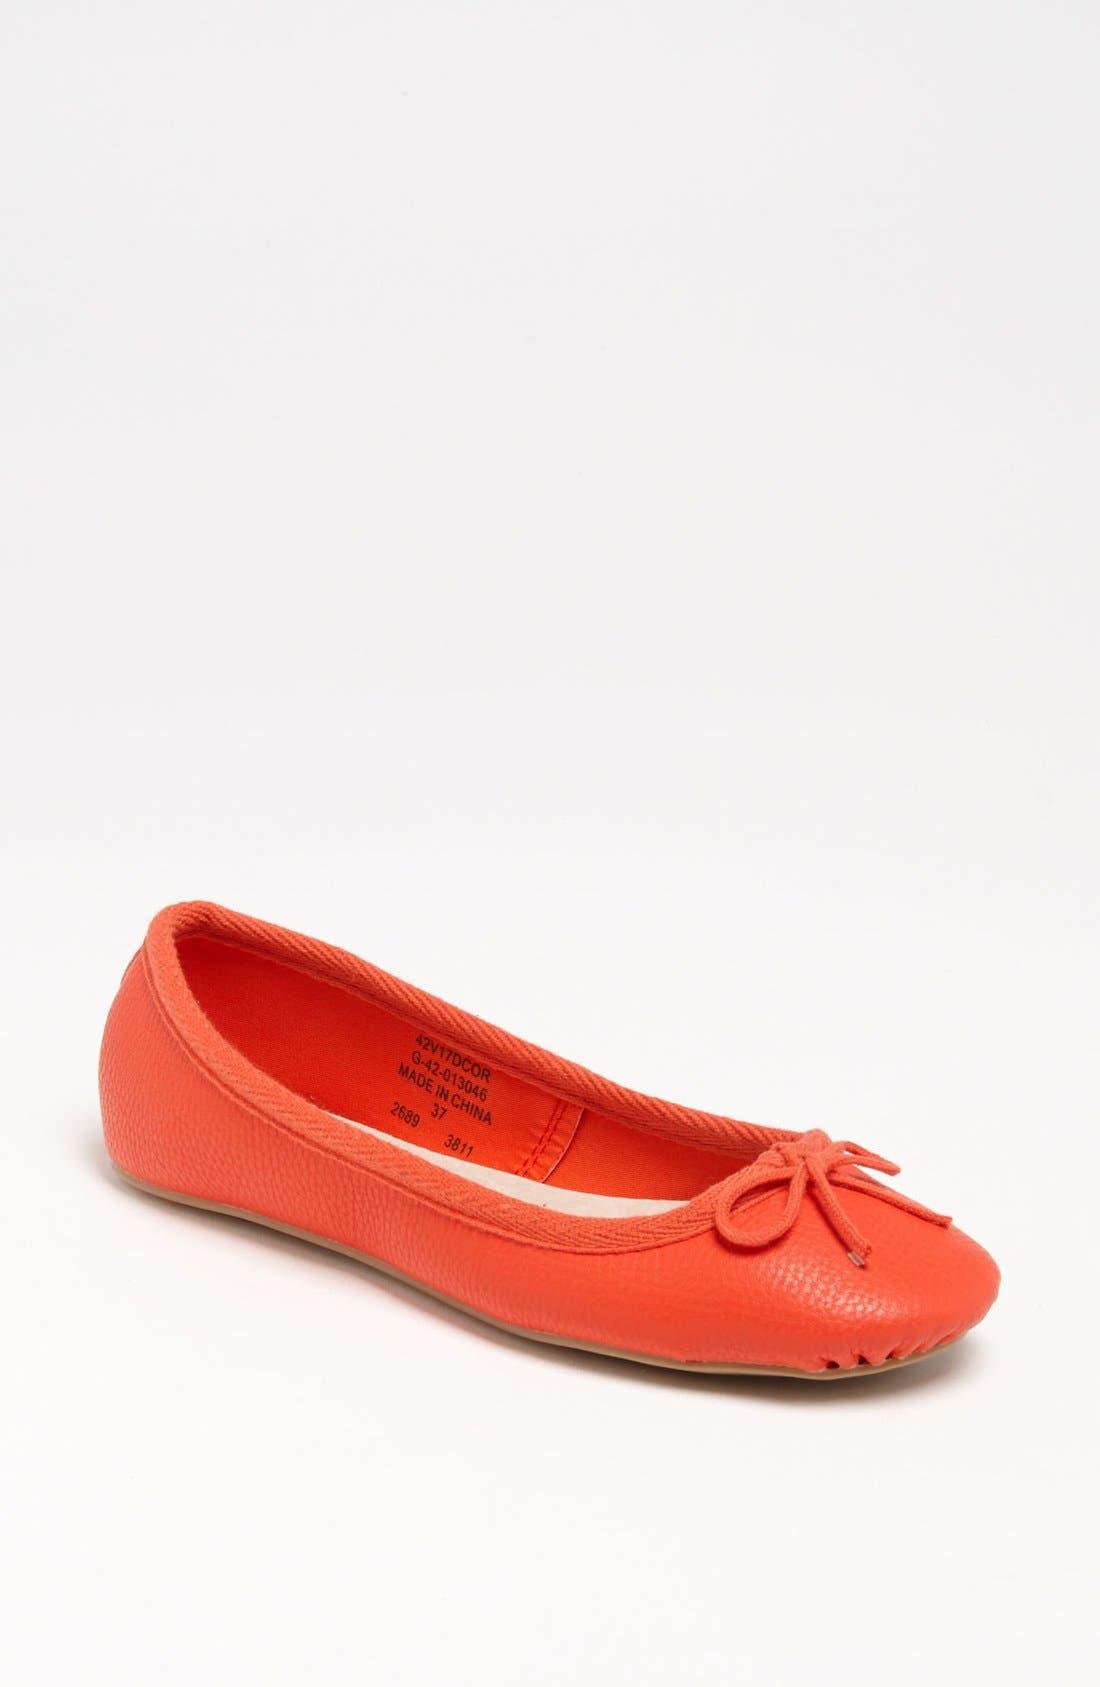 Alternate Image 1 Selected - Topshop 'Vibrant Tumbled' Ballerina Flat